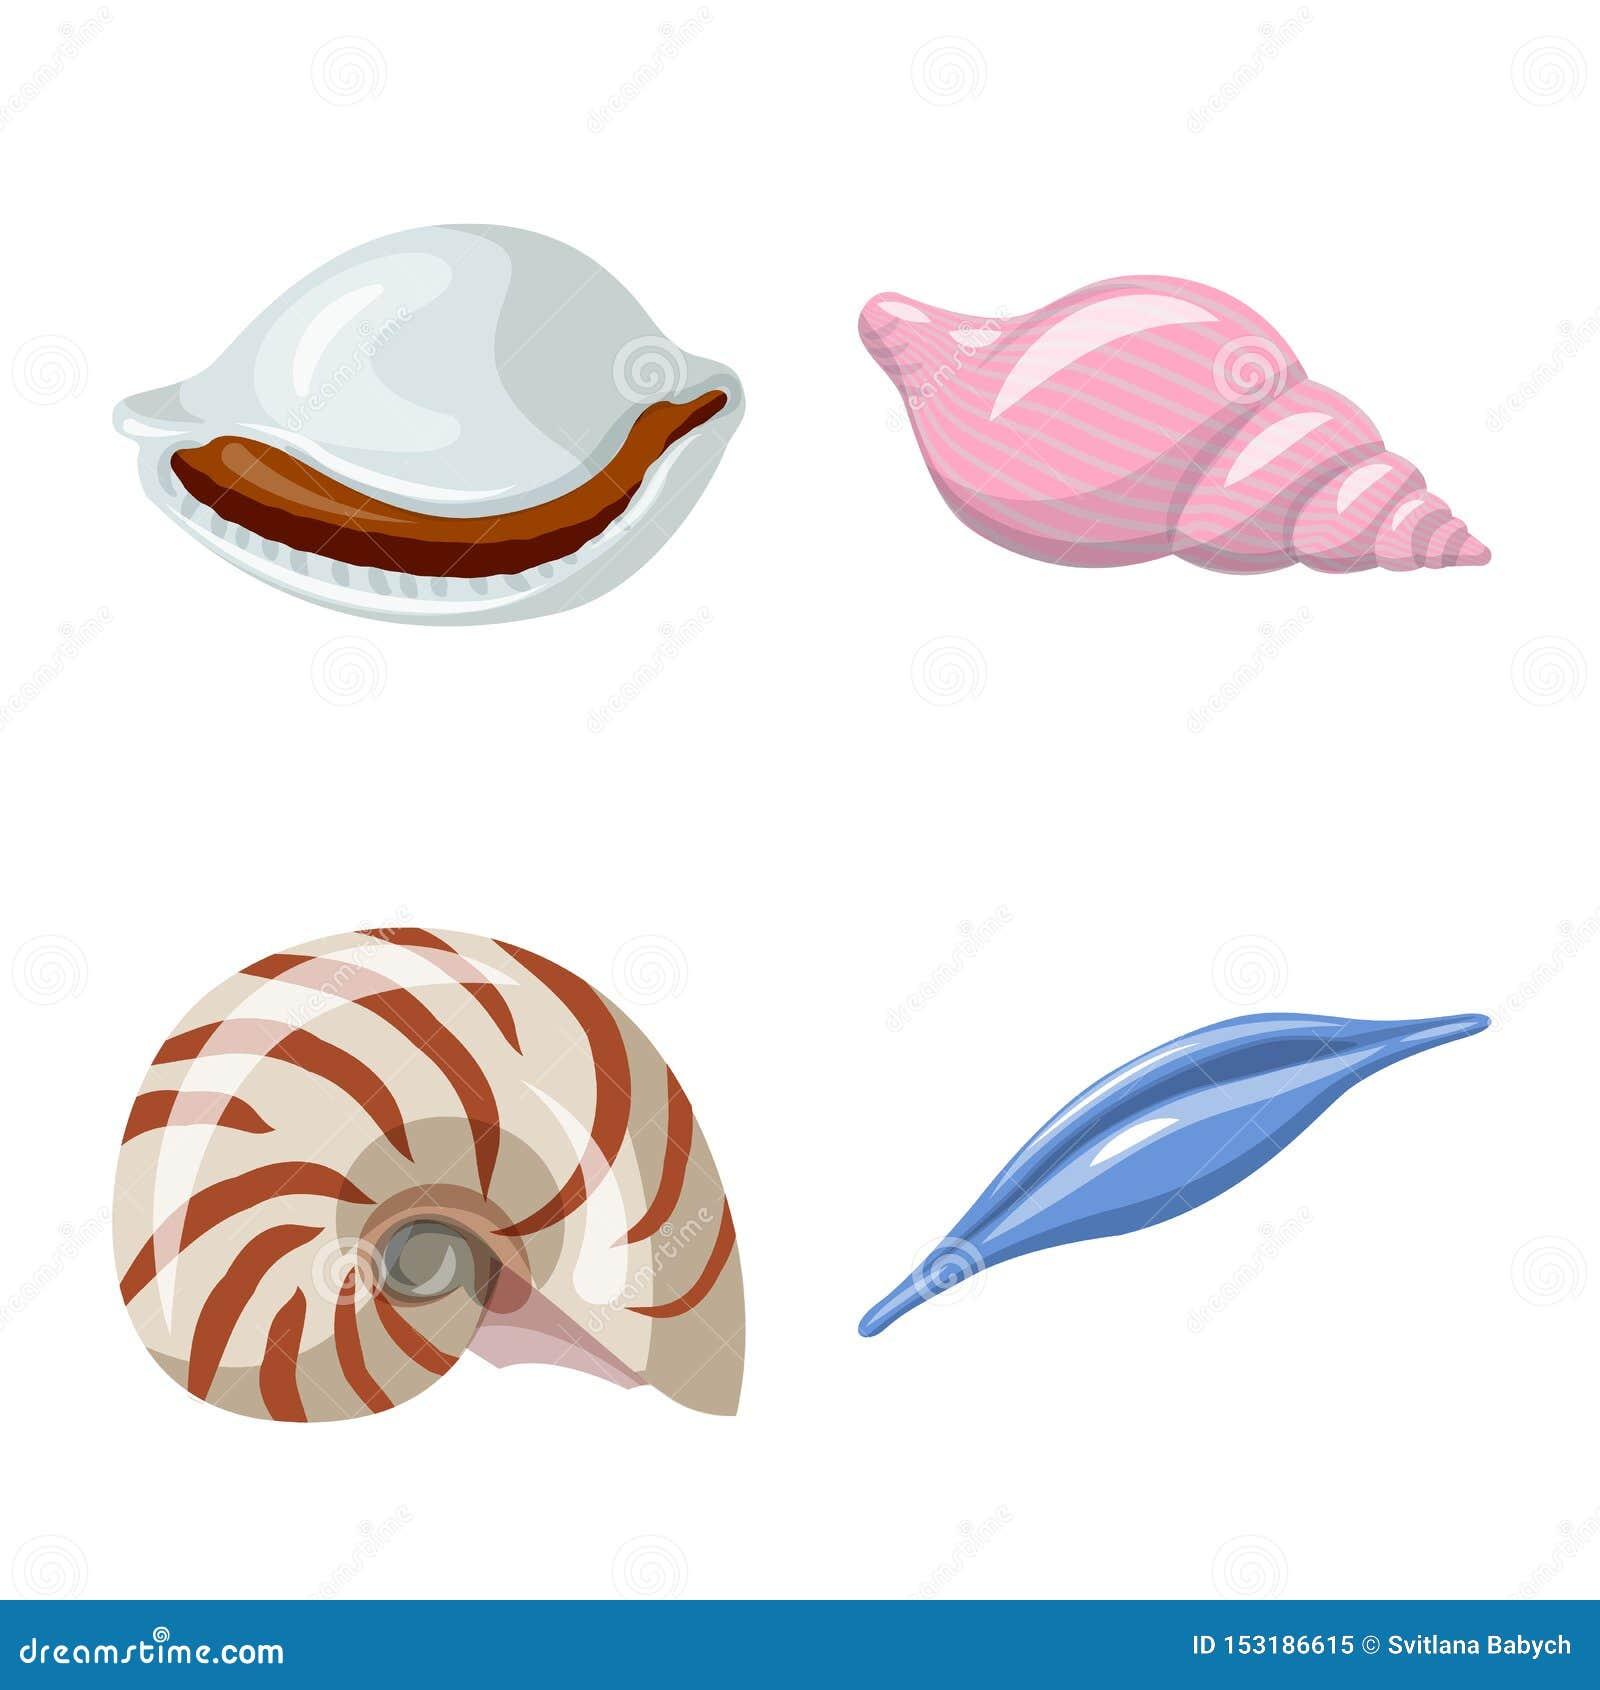 Wektorowa ilustracja seashell i mollusk symbol Kolekcja seashell i owoce morza wektorowa ikona dla zapasu